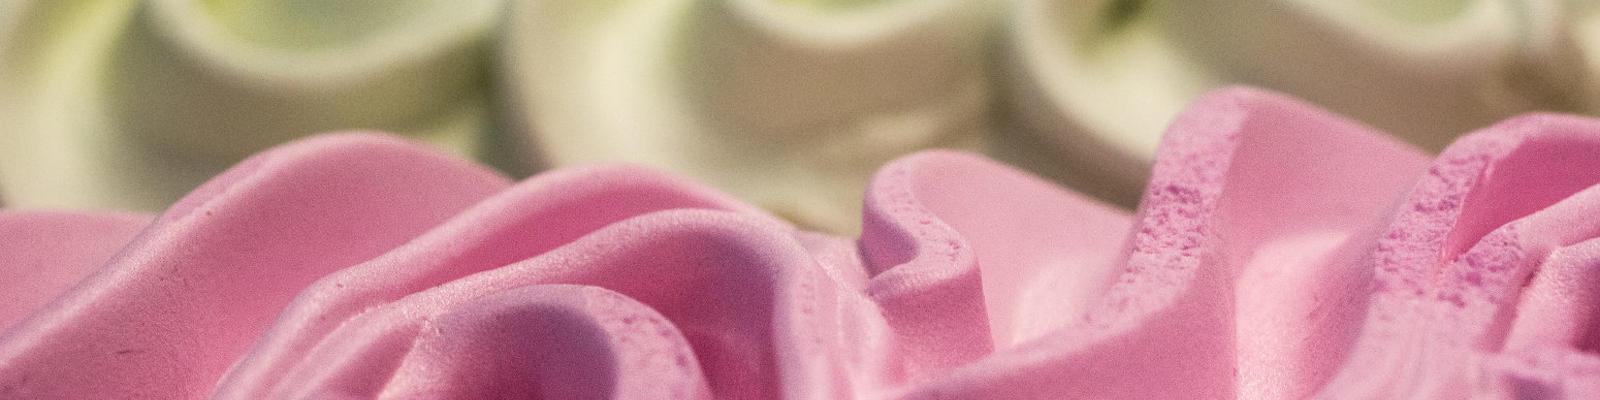 A close up of vanilla and strawberry ice cream